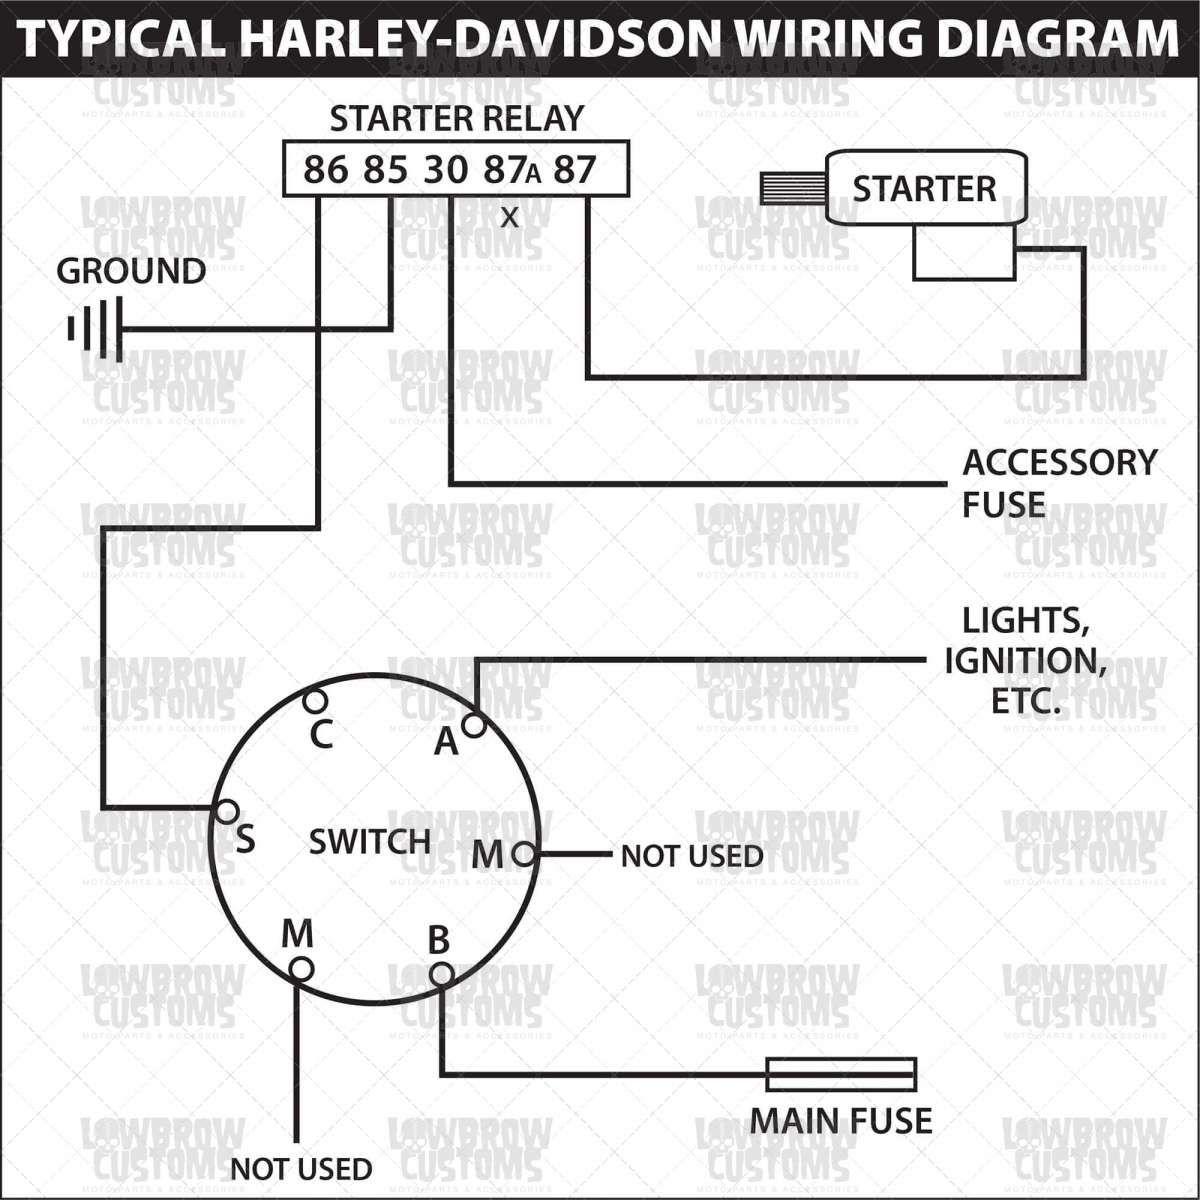 12 Motorcycle Key Switch Diagram Motorcycle Diagram Wiringg Net Diagram Electrical Wiring Diagram Wire